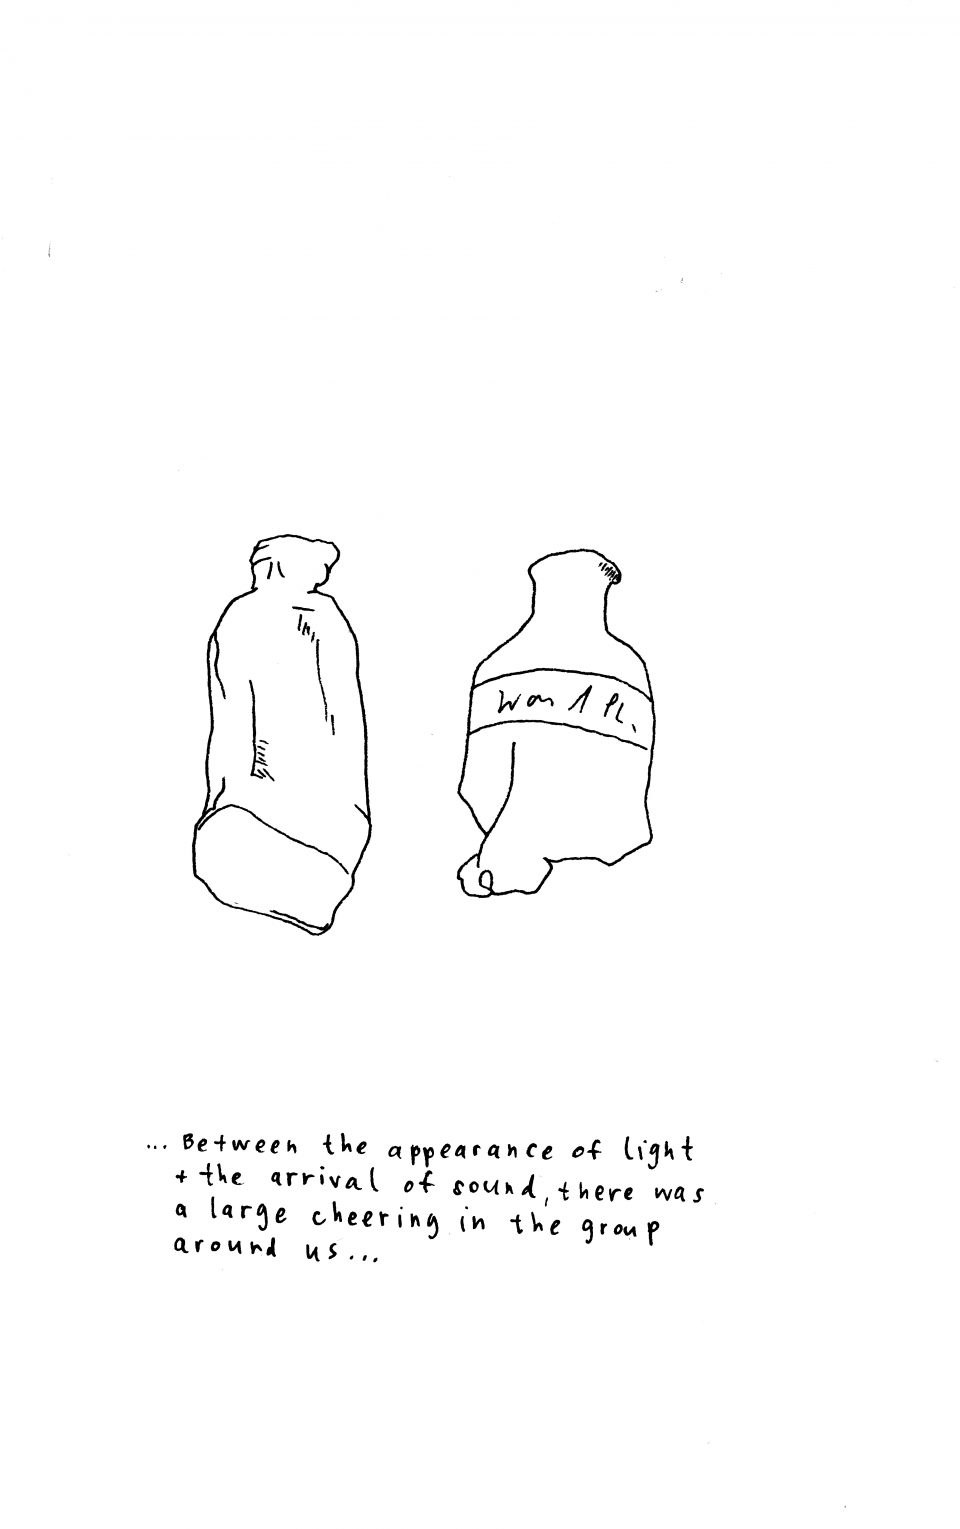 Meditation on Light and Land